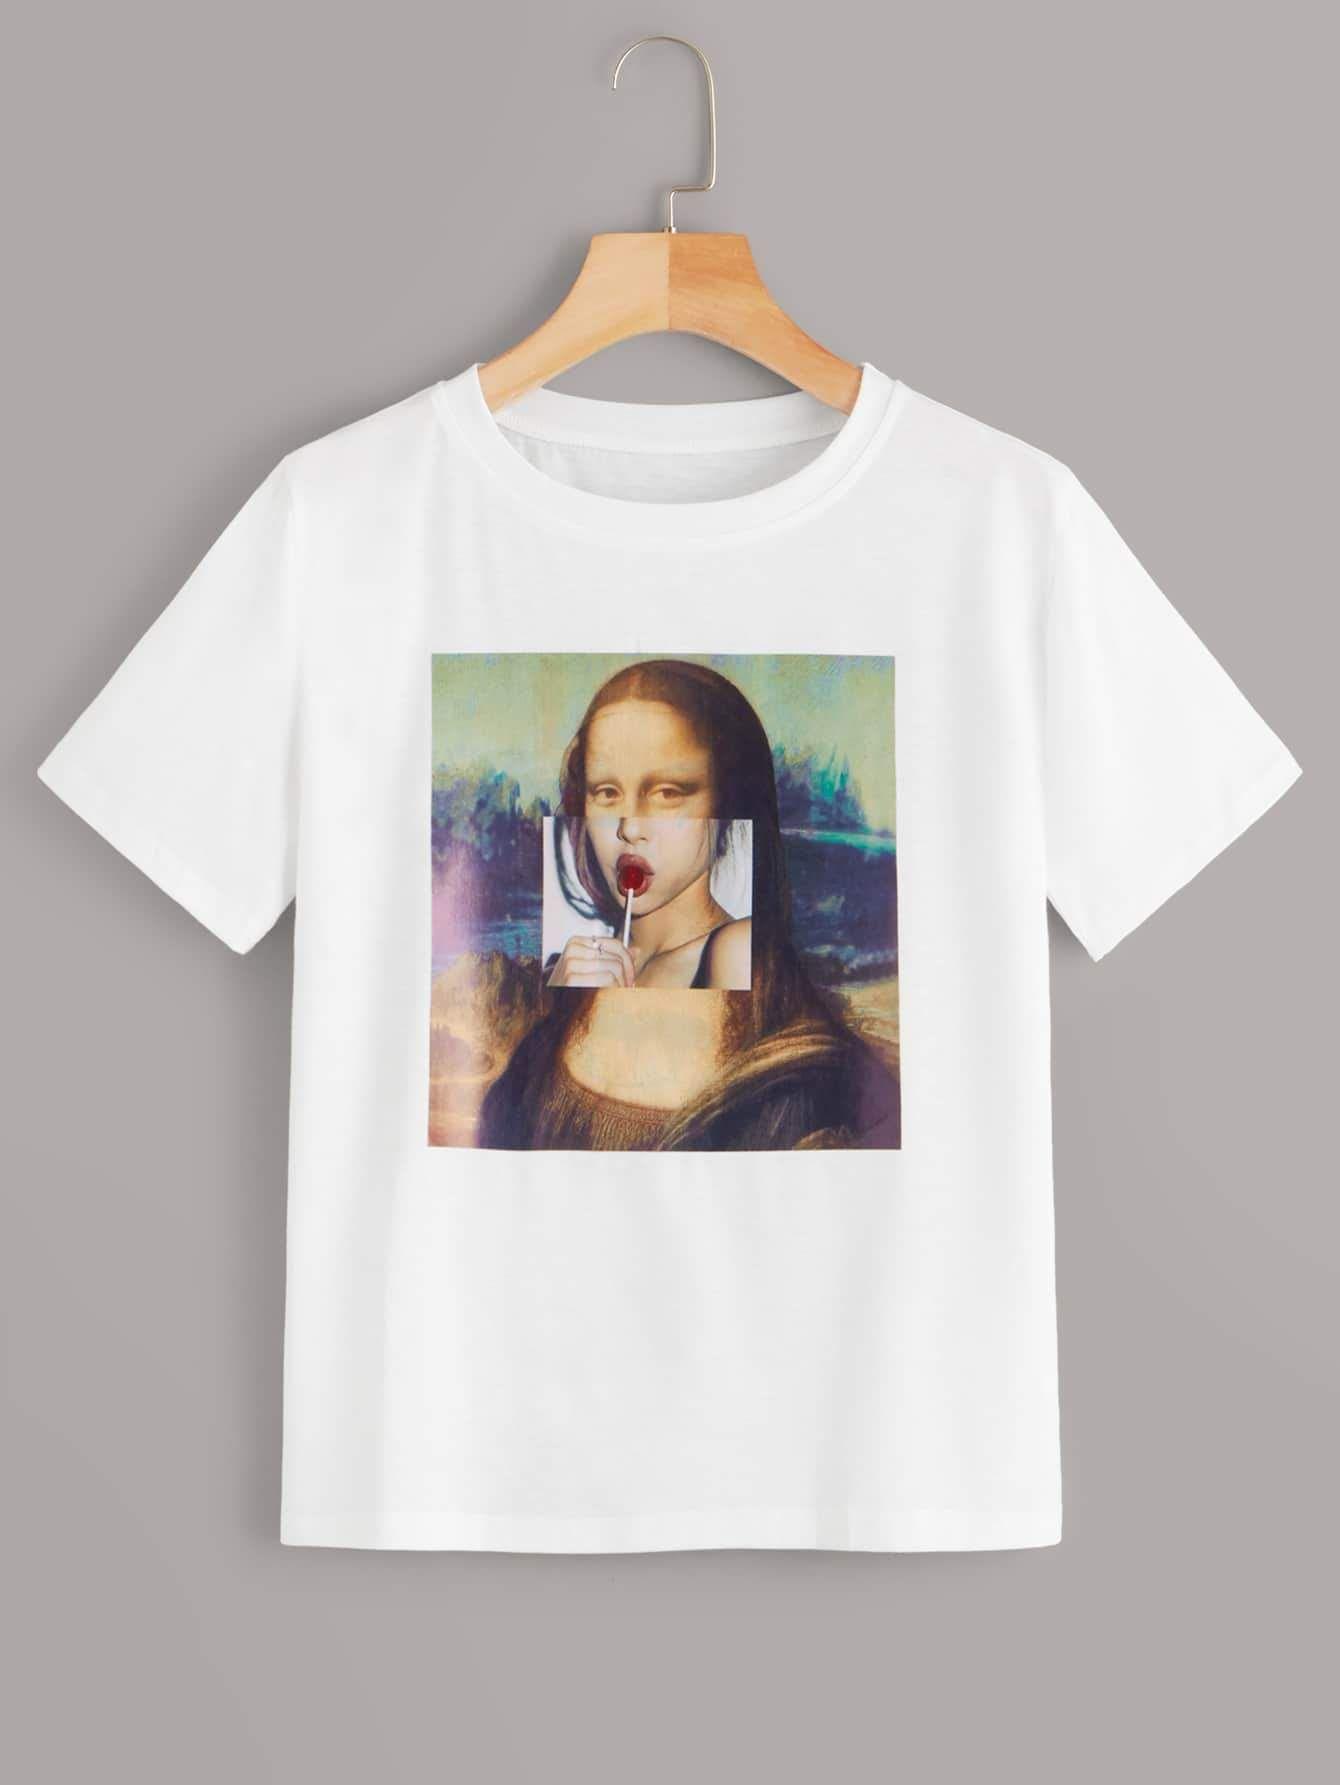 Mona Lisa señora manga corta t-shirt blanca rosa flores-patrón grandes tamaños